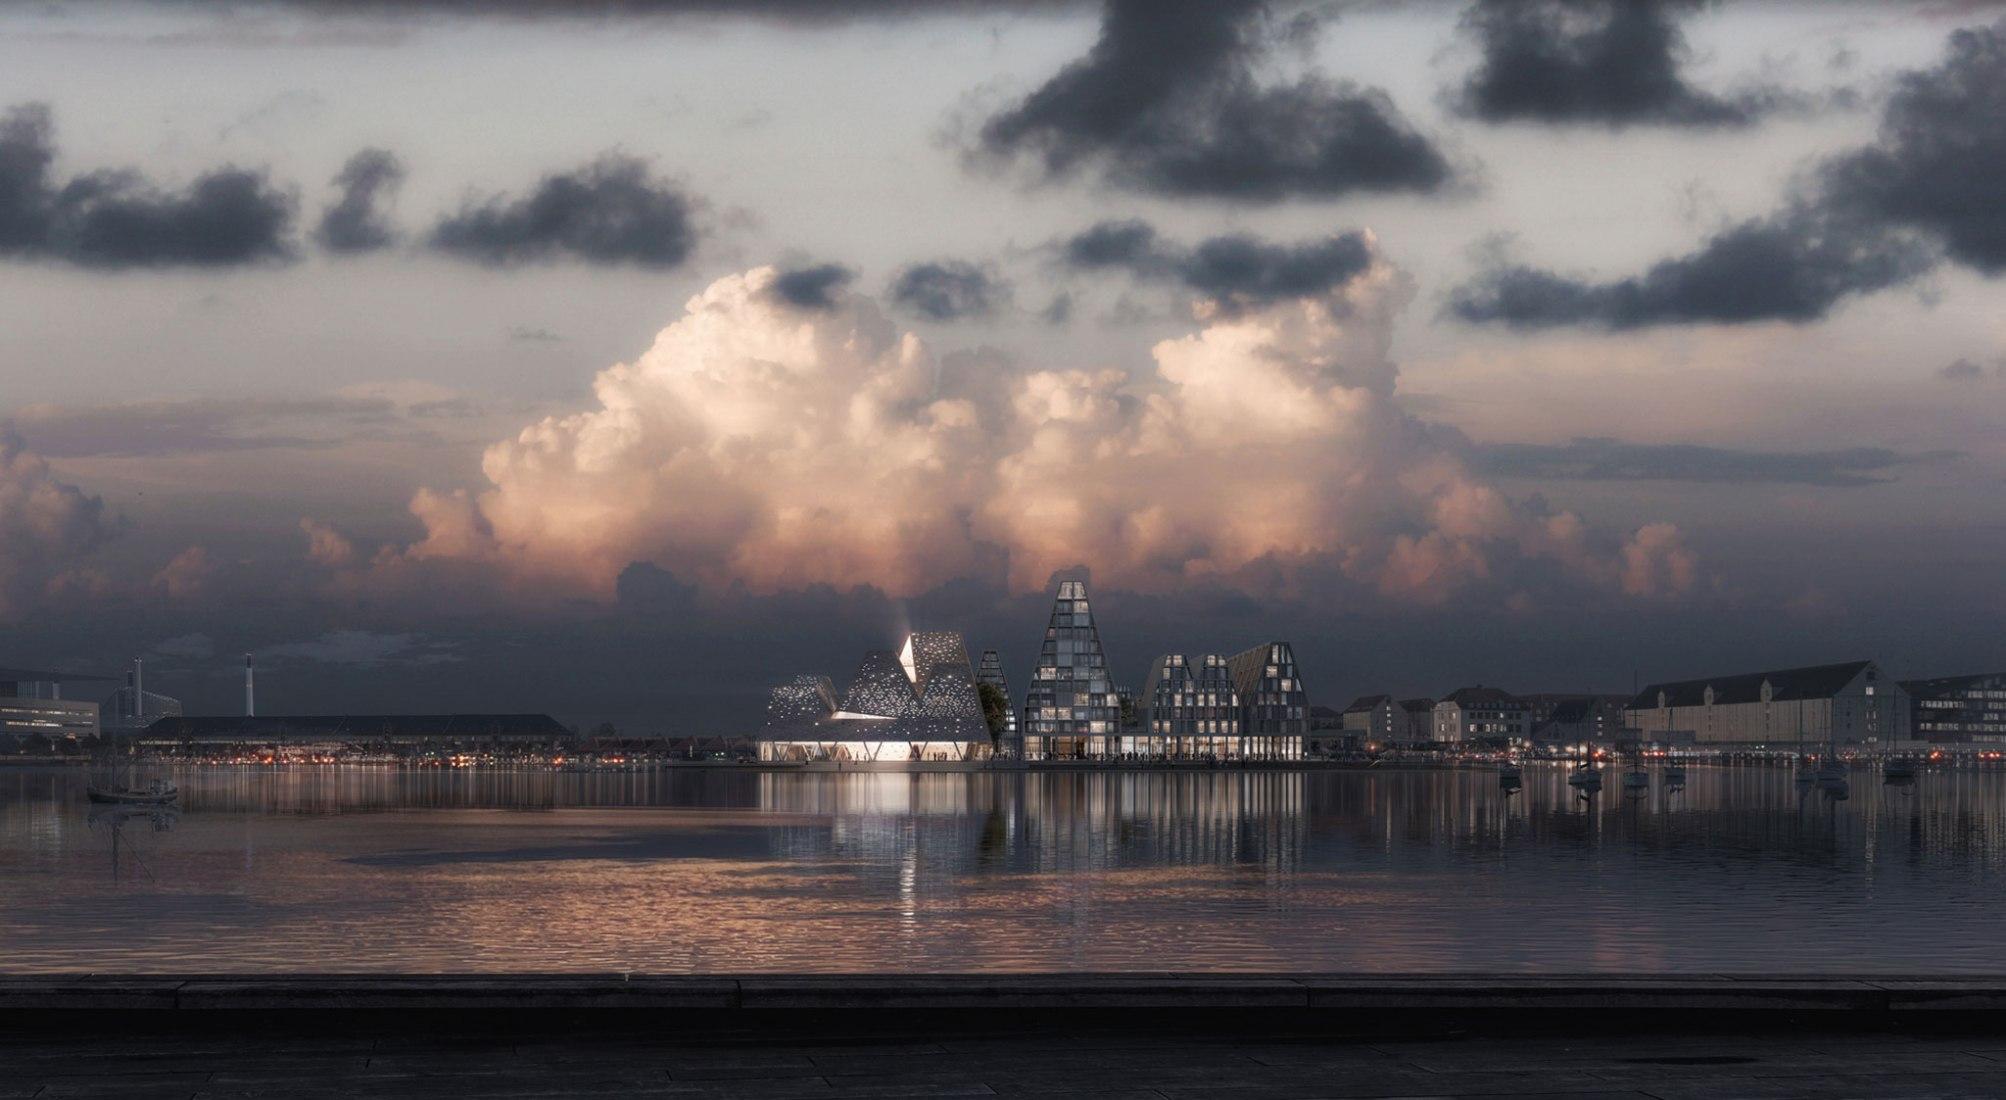 Kengo Kuma & Associates Reveal Plans for New Aquatics Centre on Copenhagen's Waterfront. Cortesy of Kengo Kuma & Associates